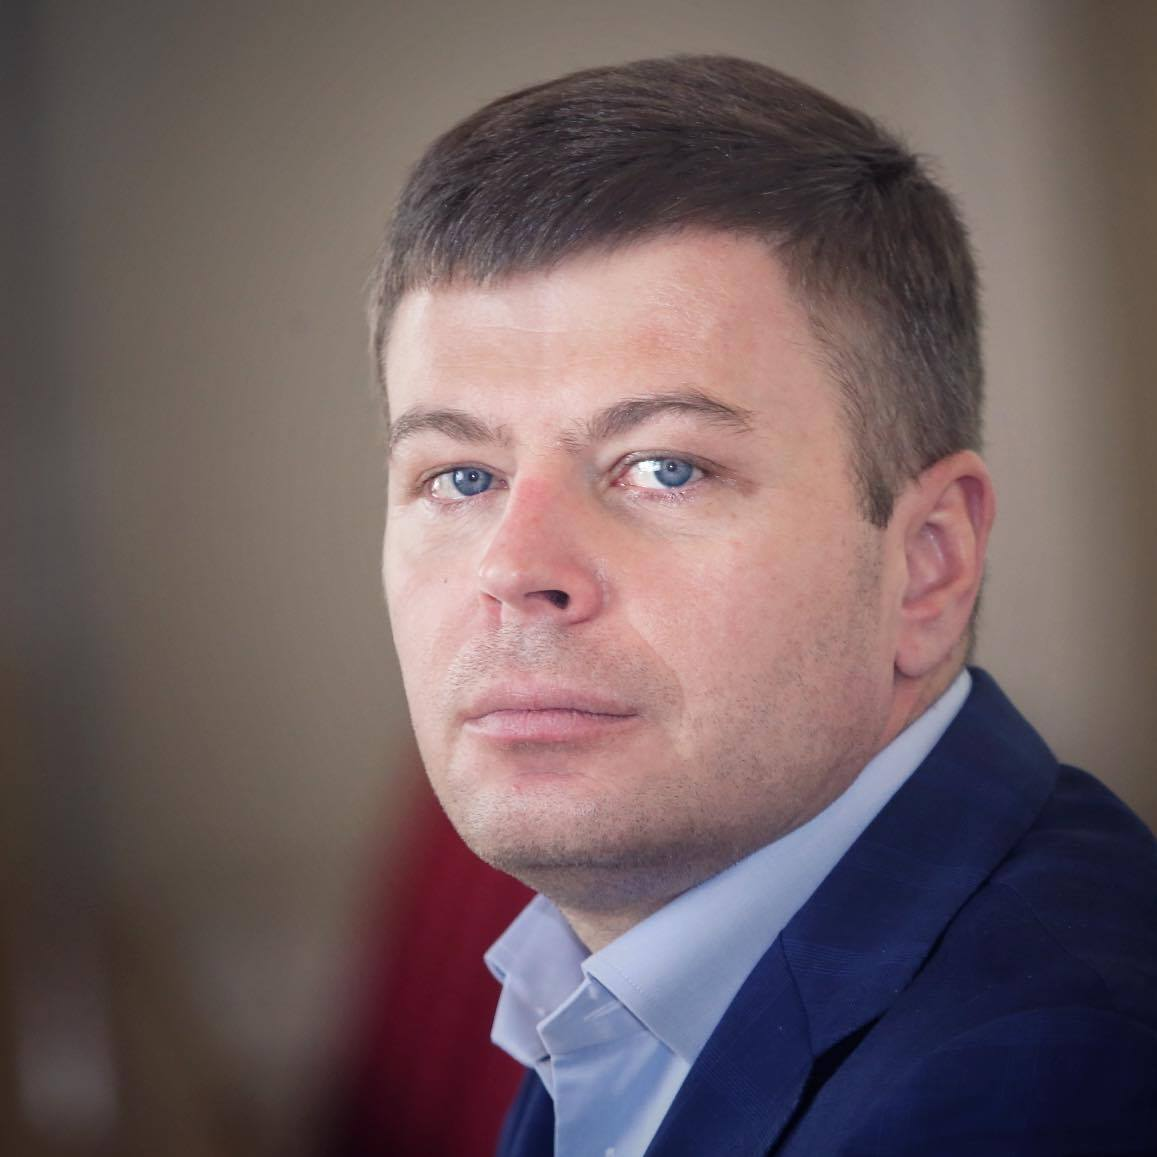 Андрей Пузийчук (фото: фейсбук)